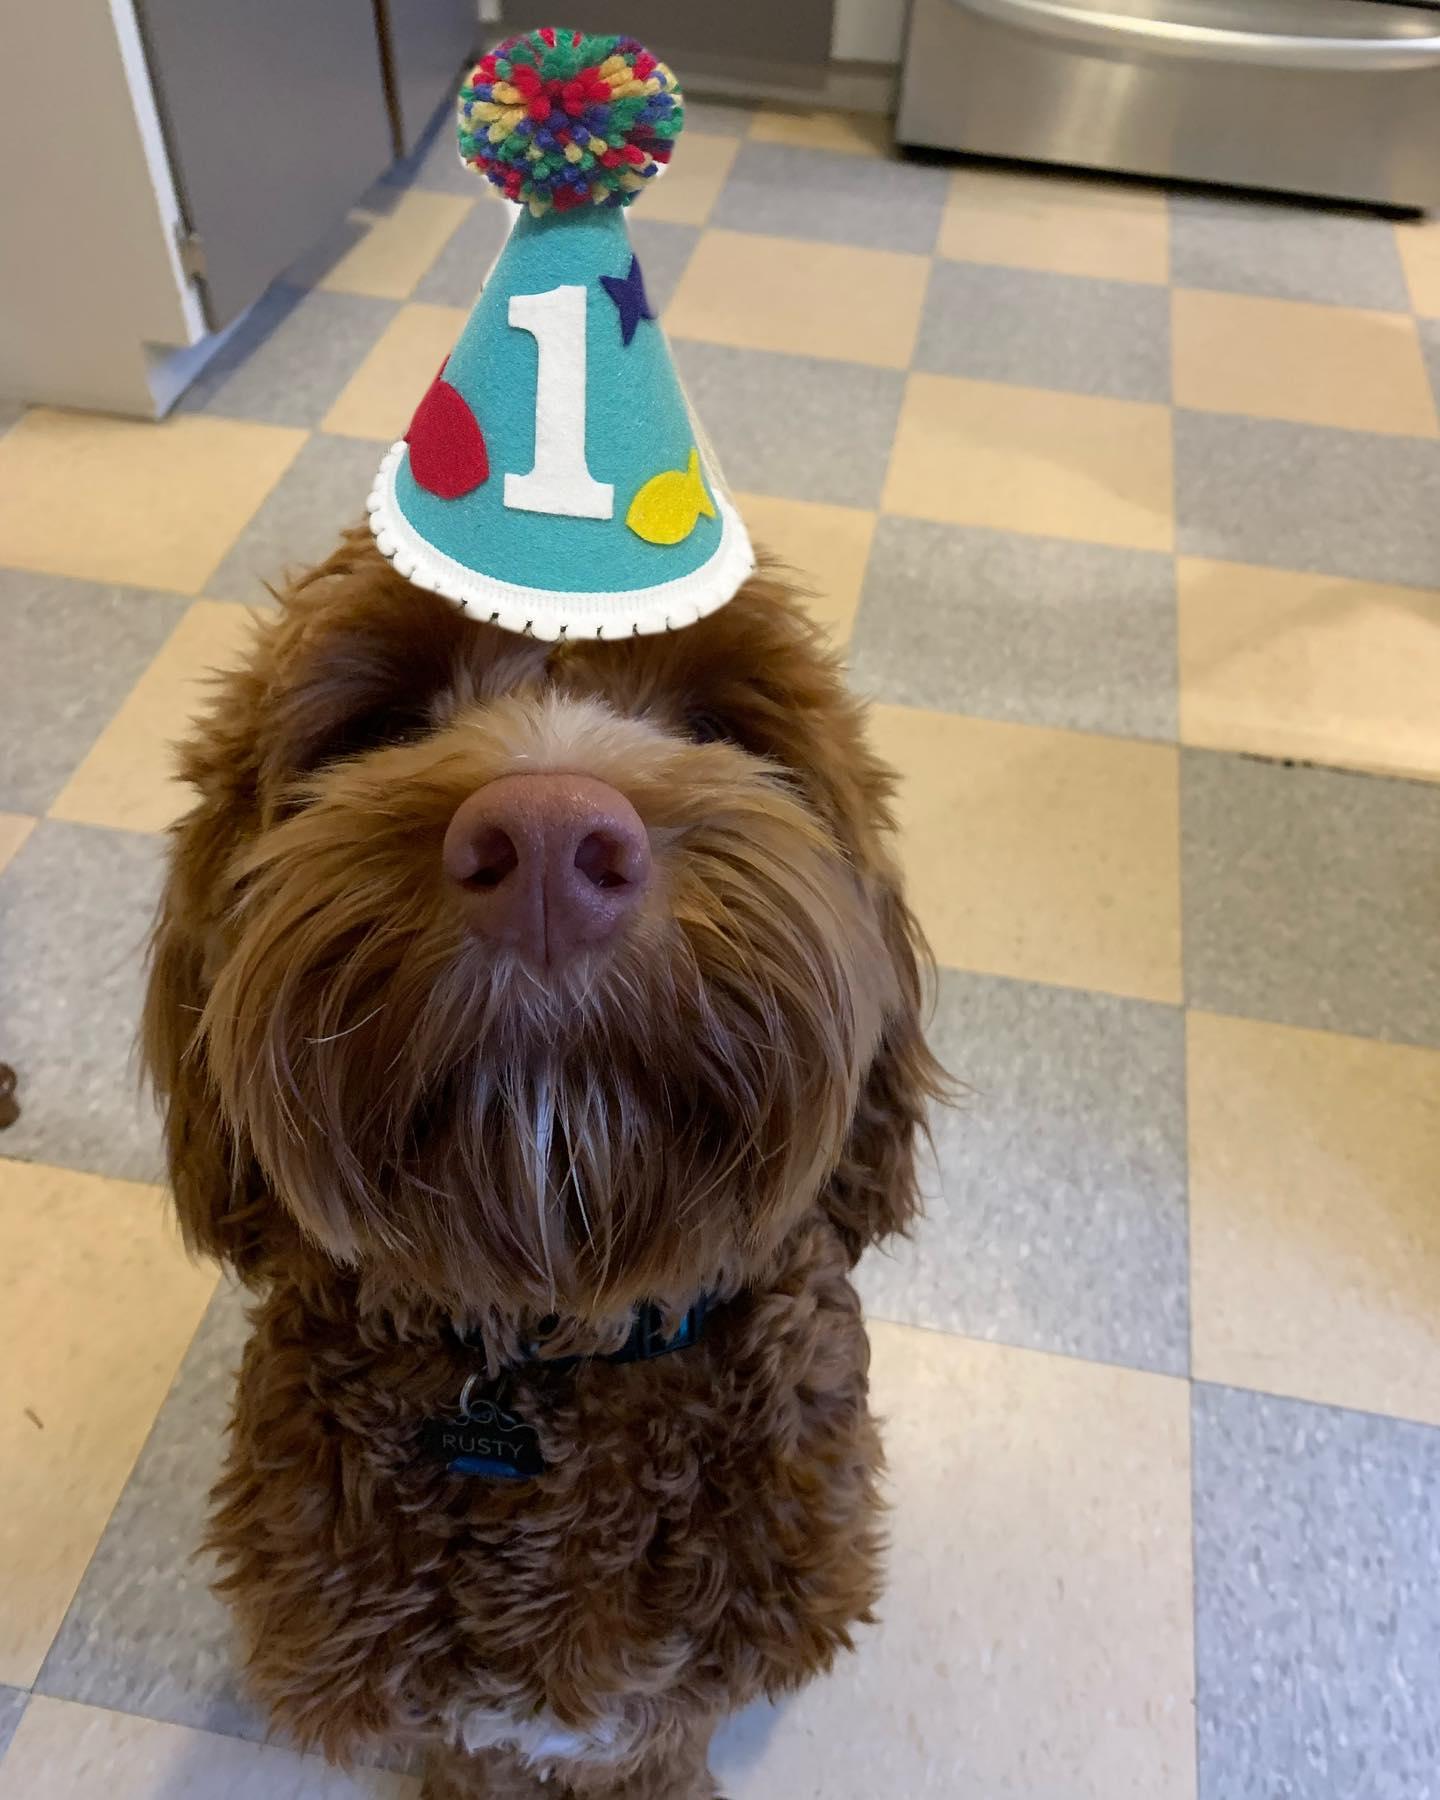 The dood turned 1! Happy birthday @rusty.the.dog.yyj #labradoodle #rustydoodle